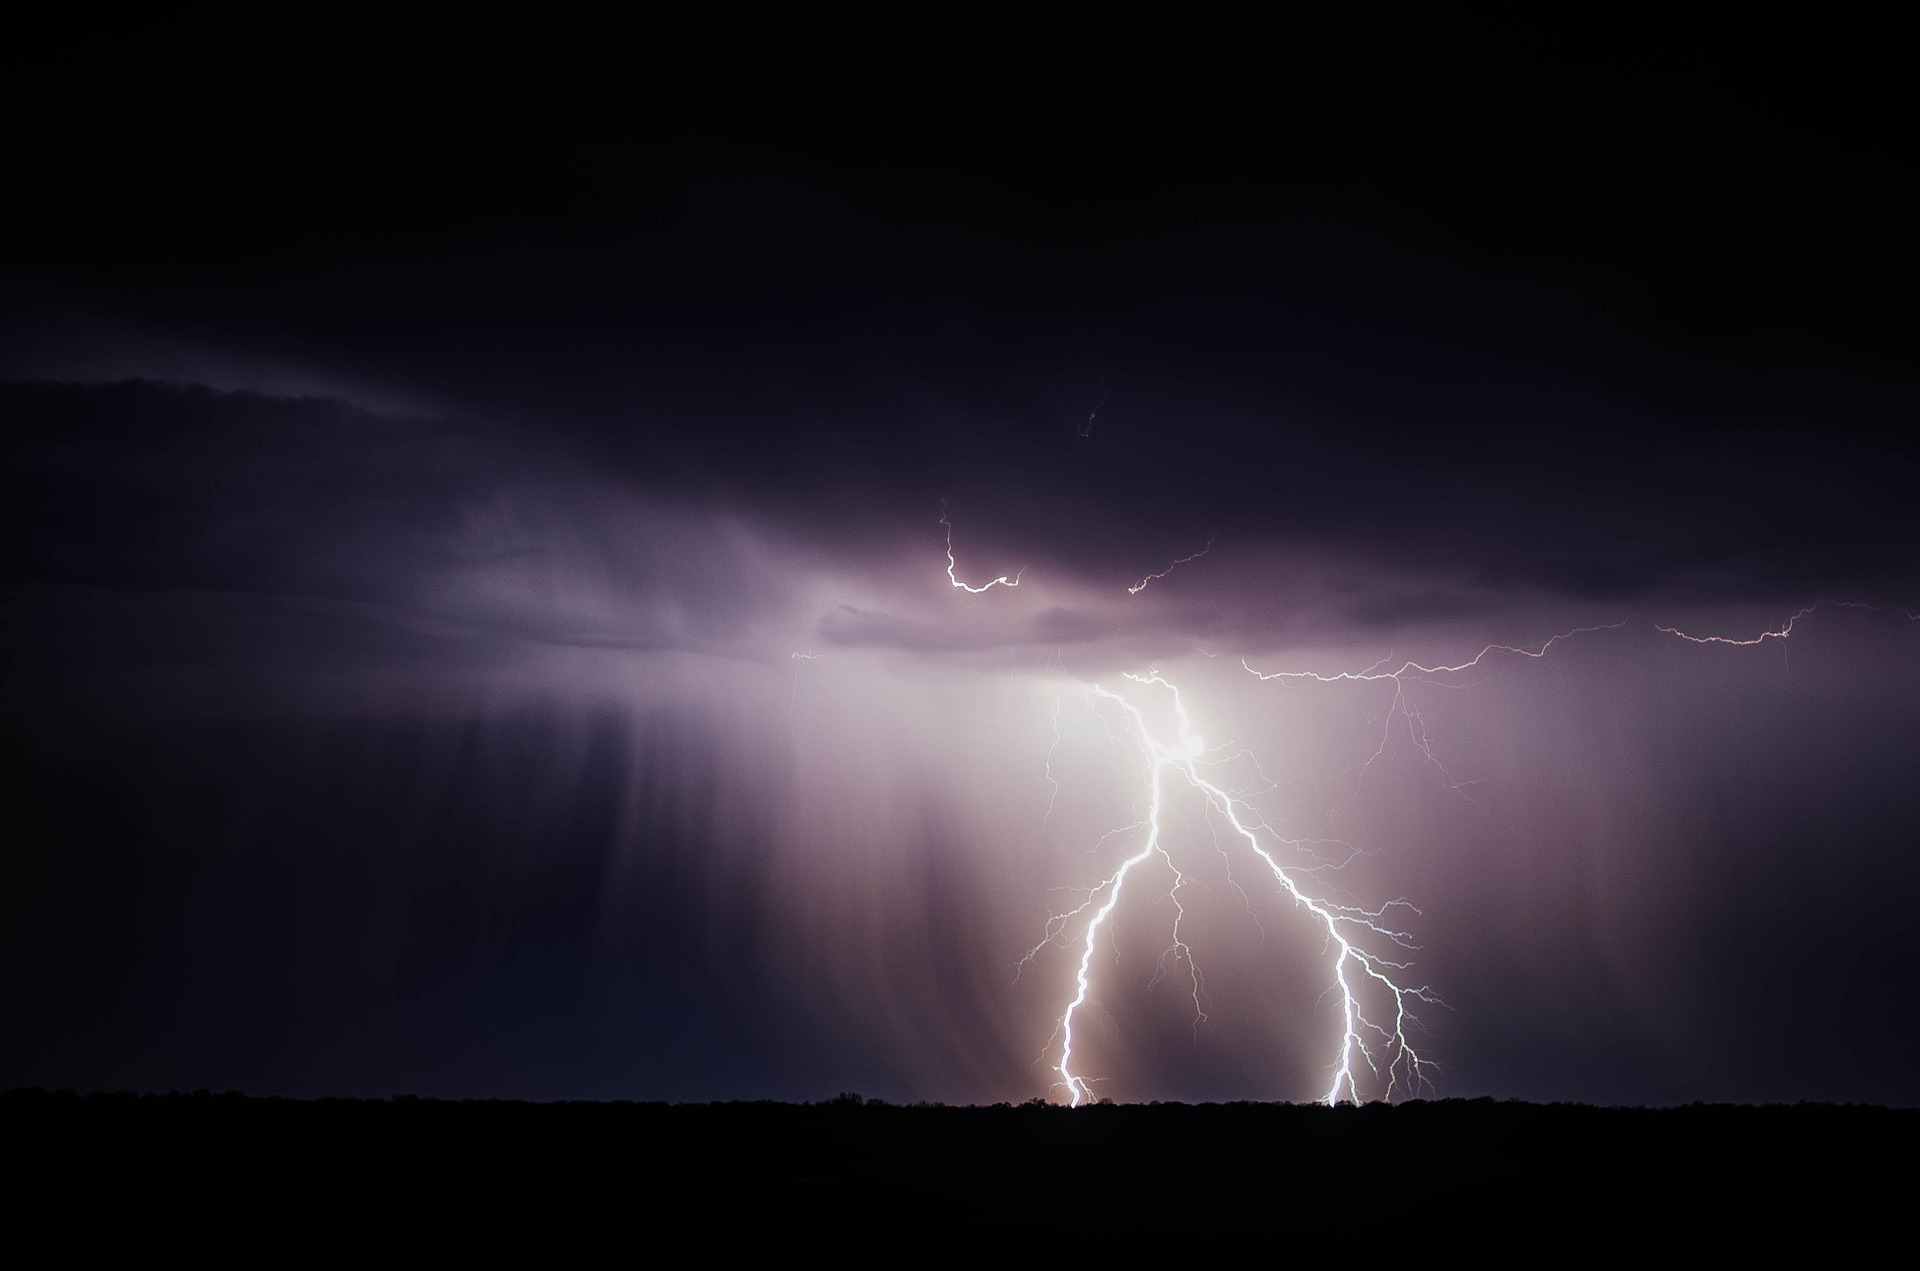 嵐 世界 経済